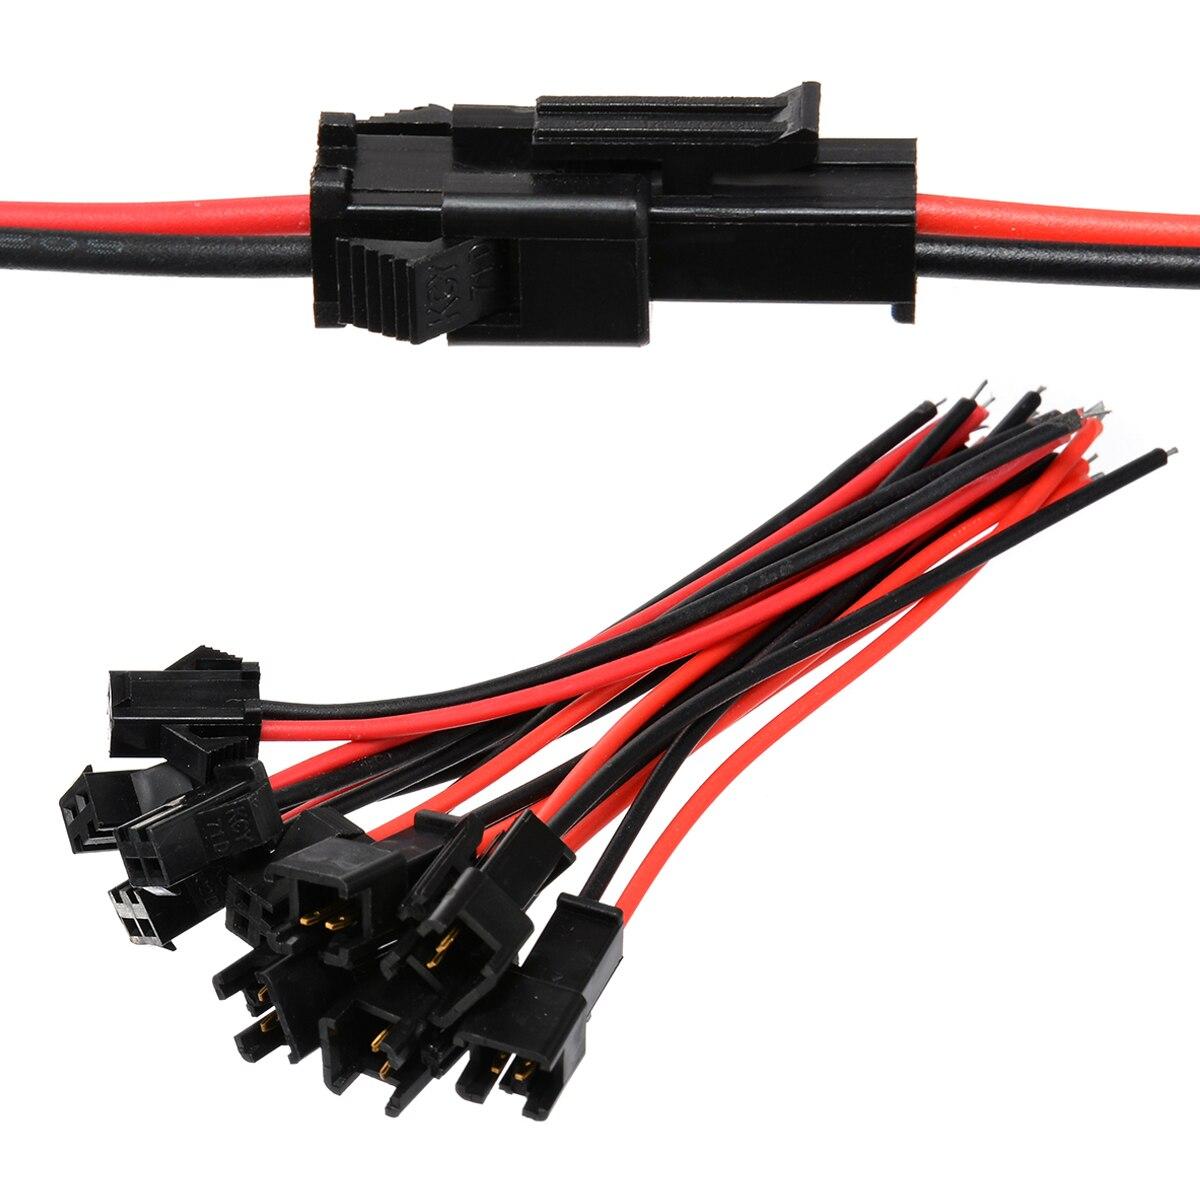 EClyxun 10 Pair/lot SM2.54 SM 2.54MM 2P 2 Pin Plug Male to